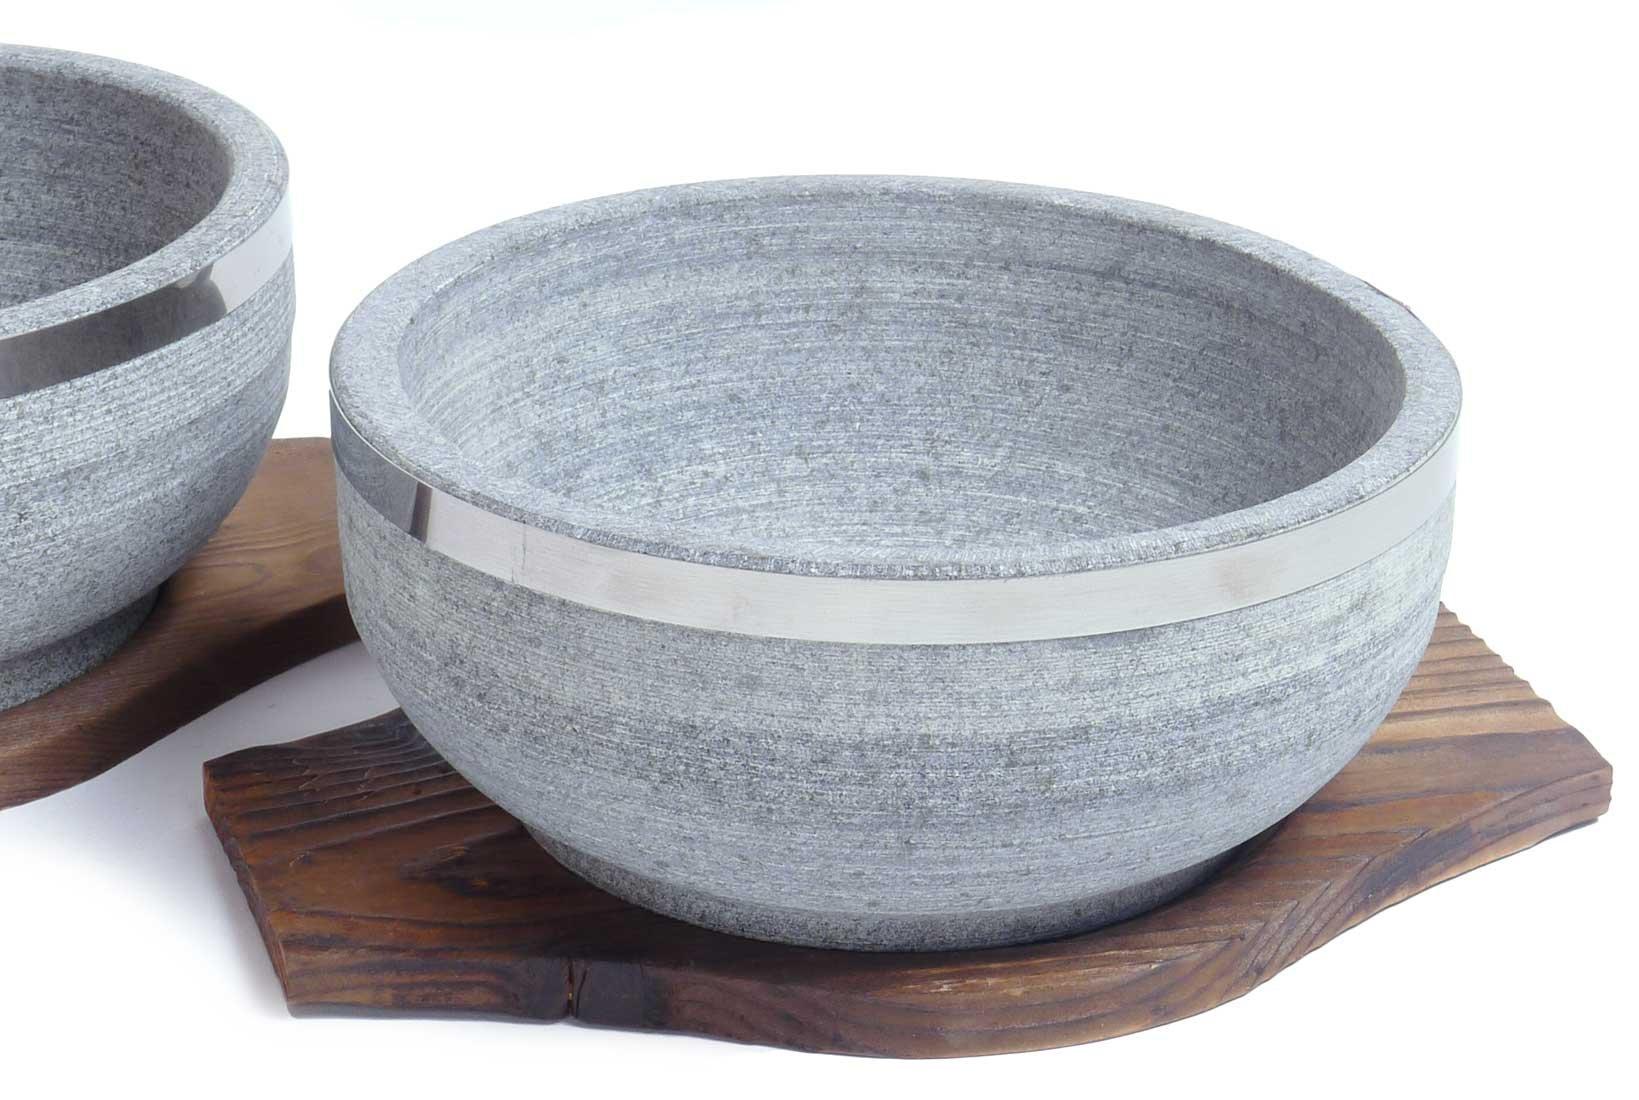 Spiceberry Home Granite Stone Dolsot Bibimbap Bowls, Case of 8 Bowls